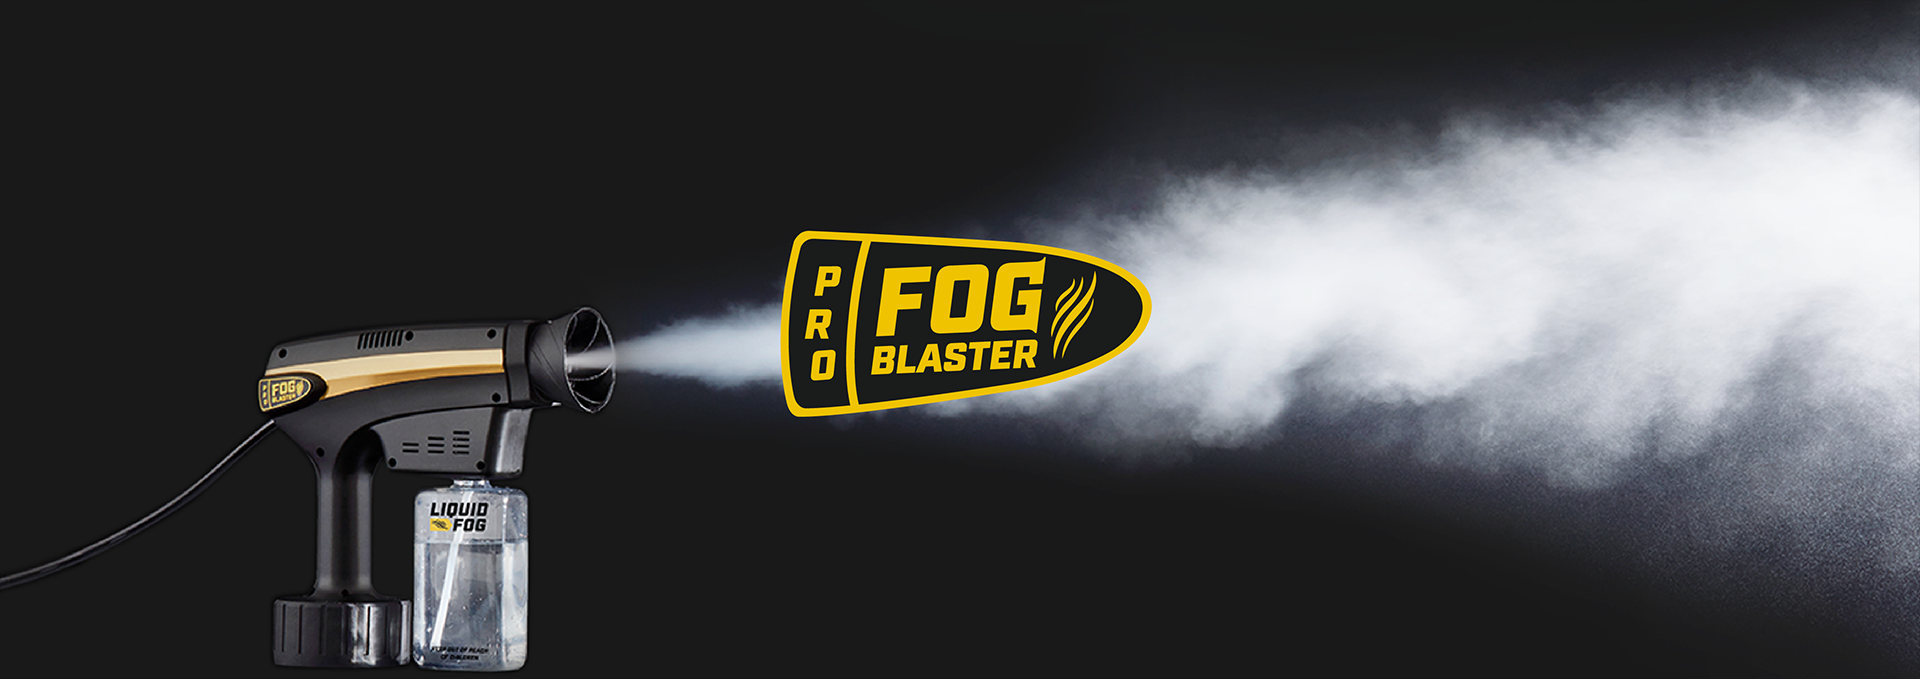 fog blaster blast with logo